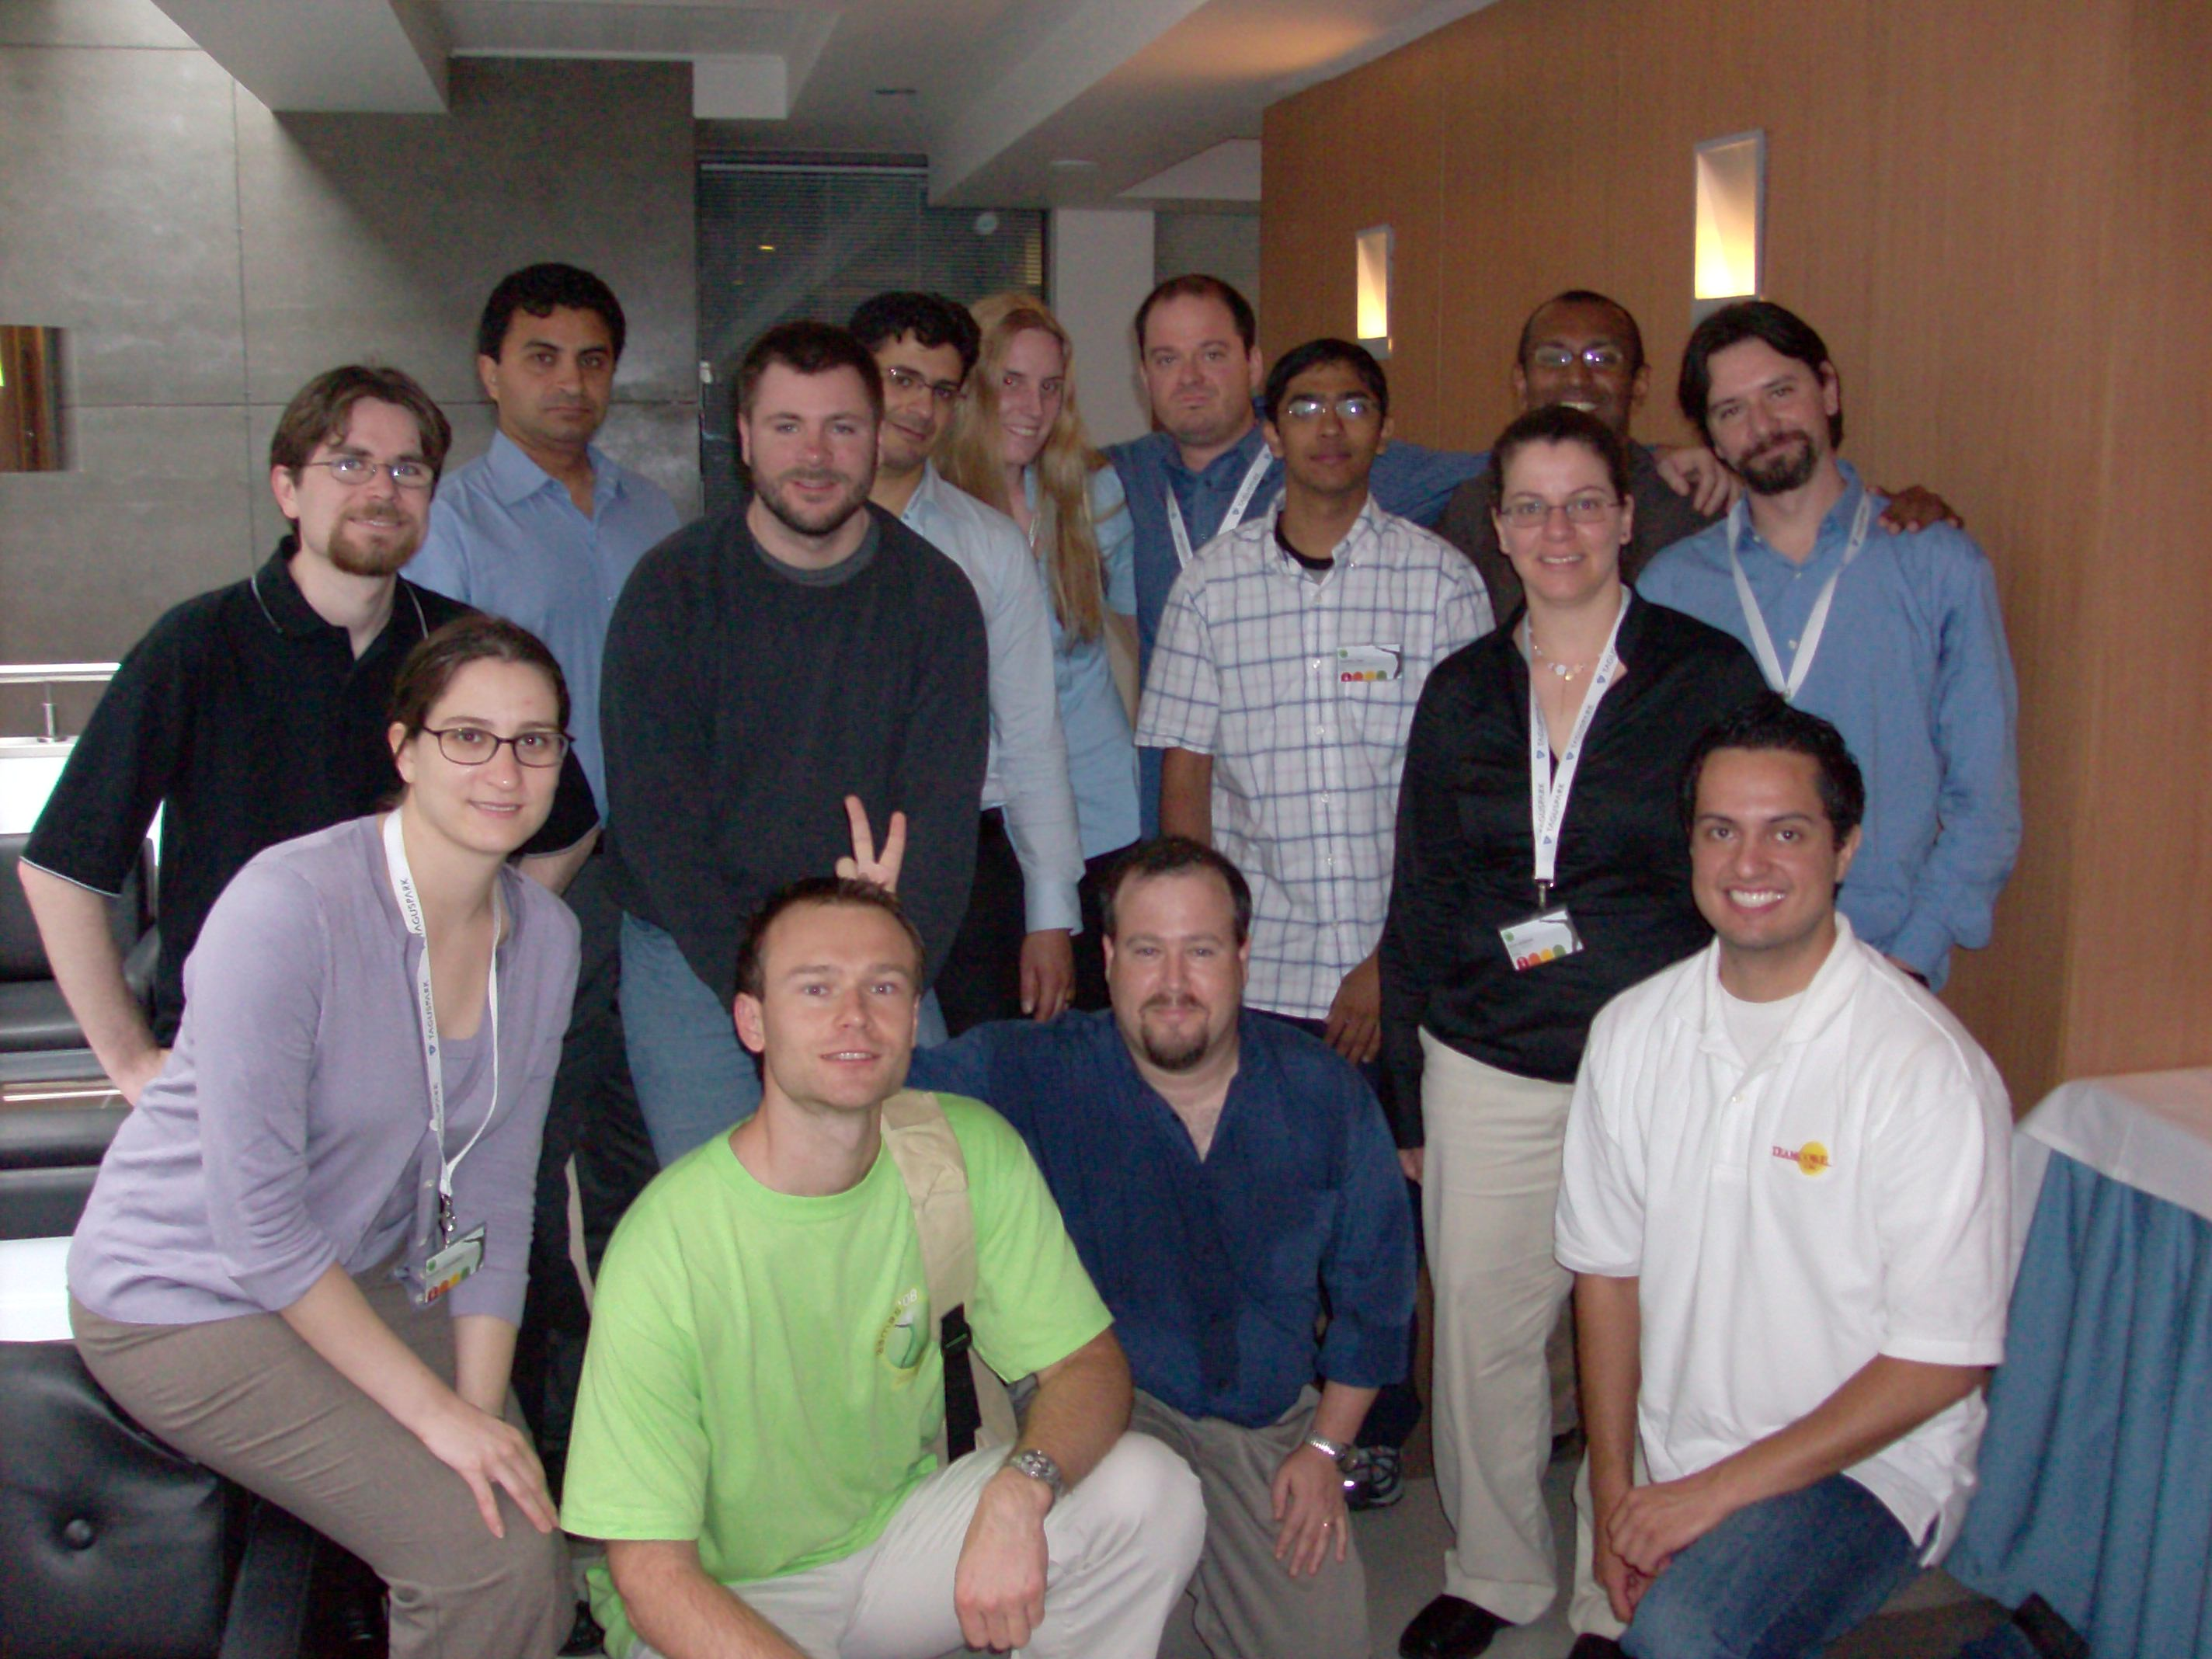 Teamcore Breakfast 2008